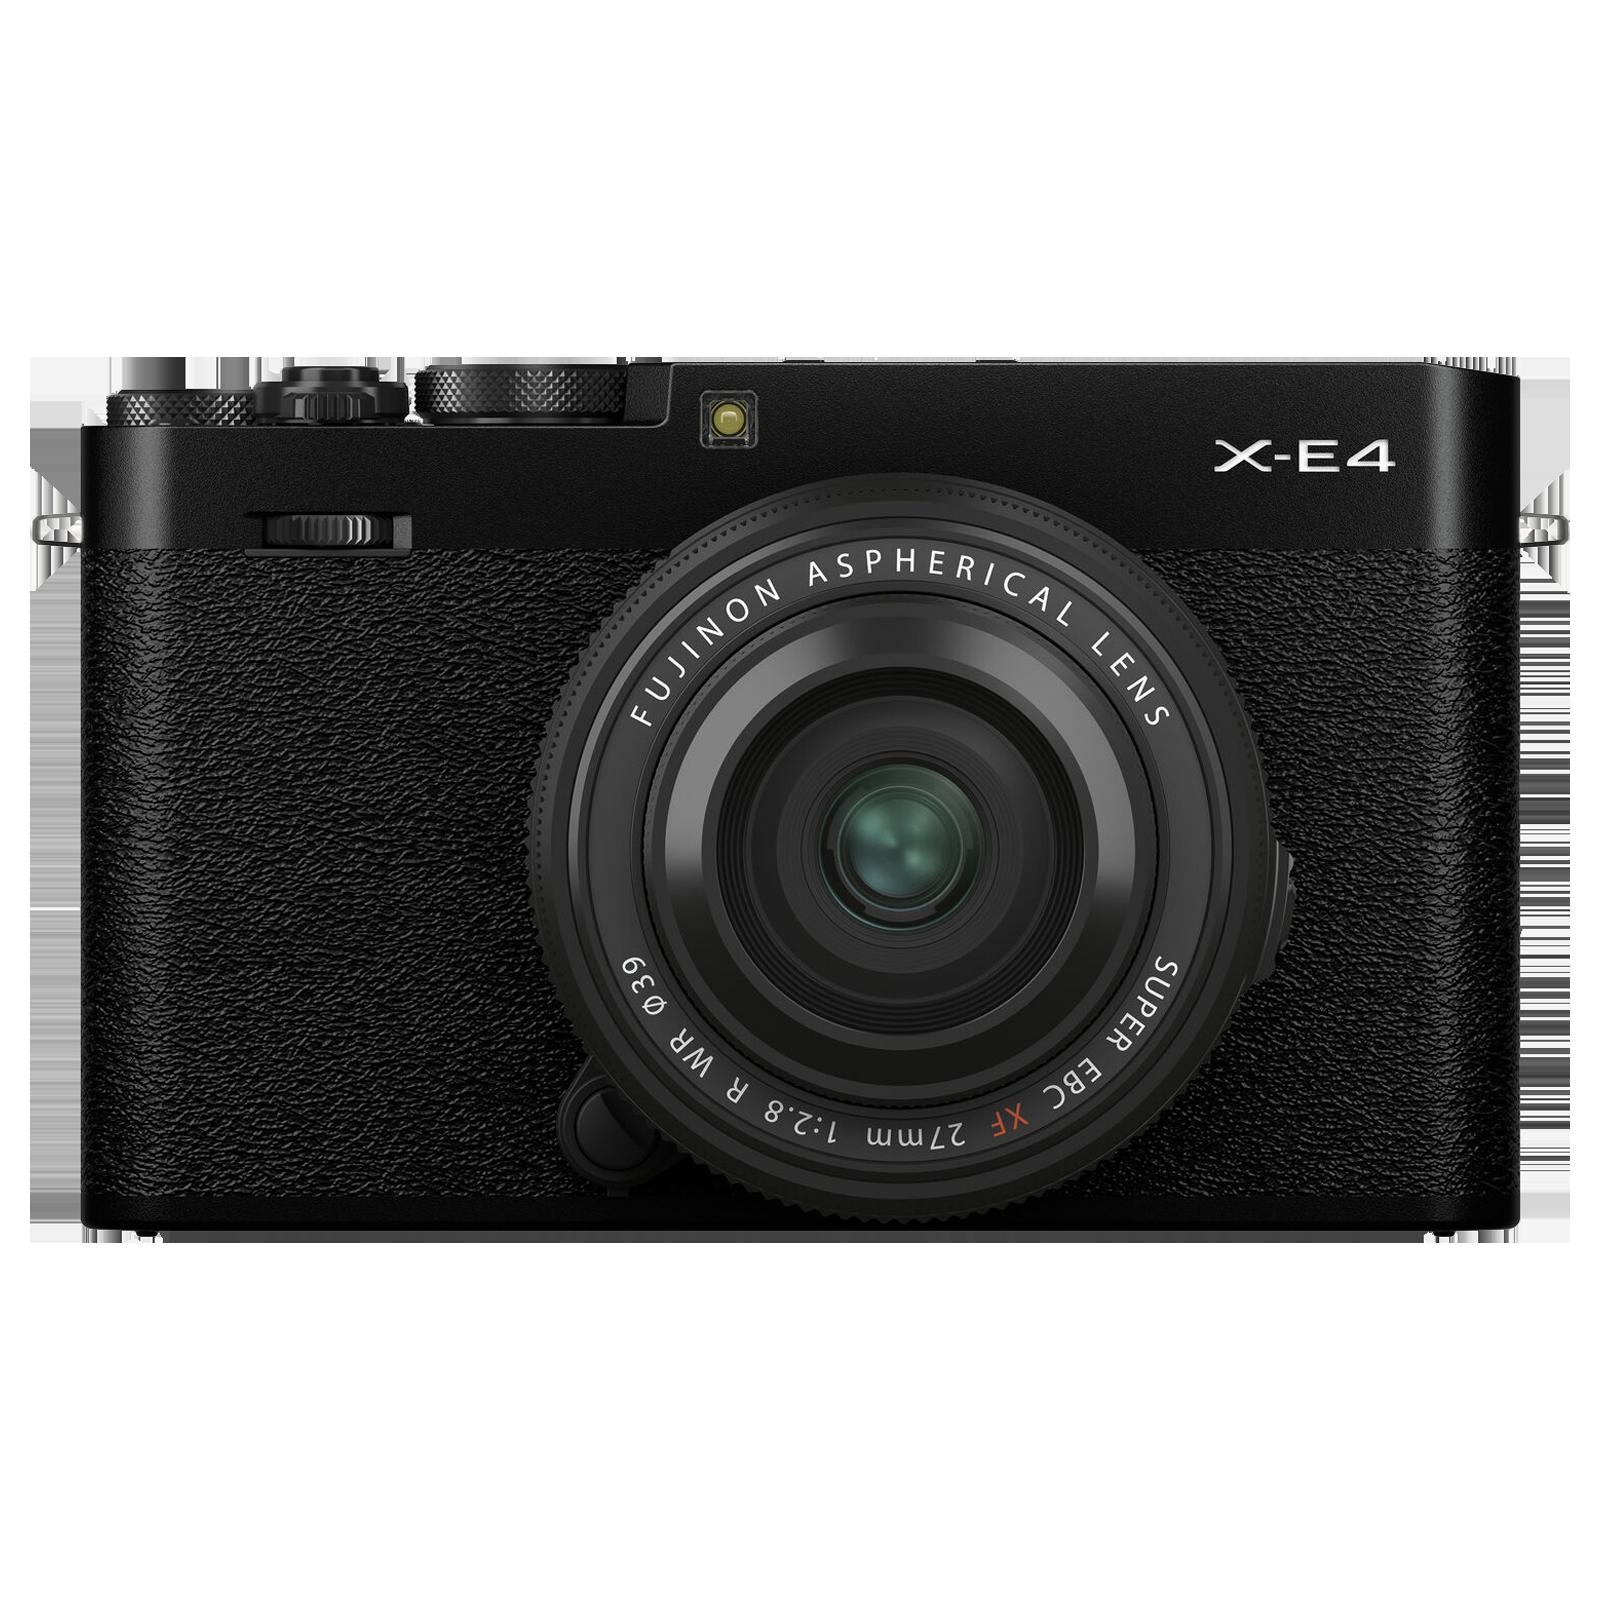 Fujifilm X-E4 26.1MP Mirrorless Camera (XF 27 mm Lens, Electronic Viewfinder, Black)_1